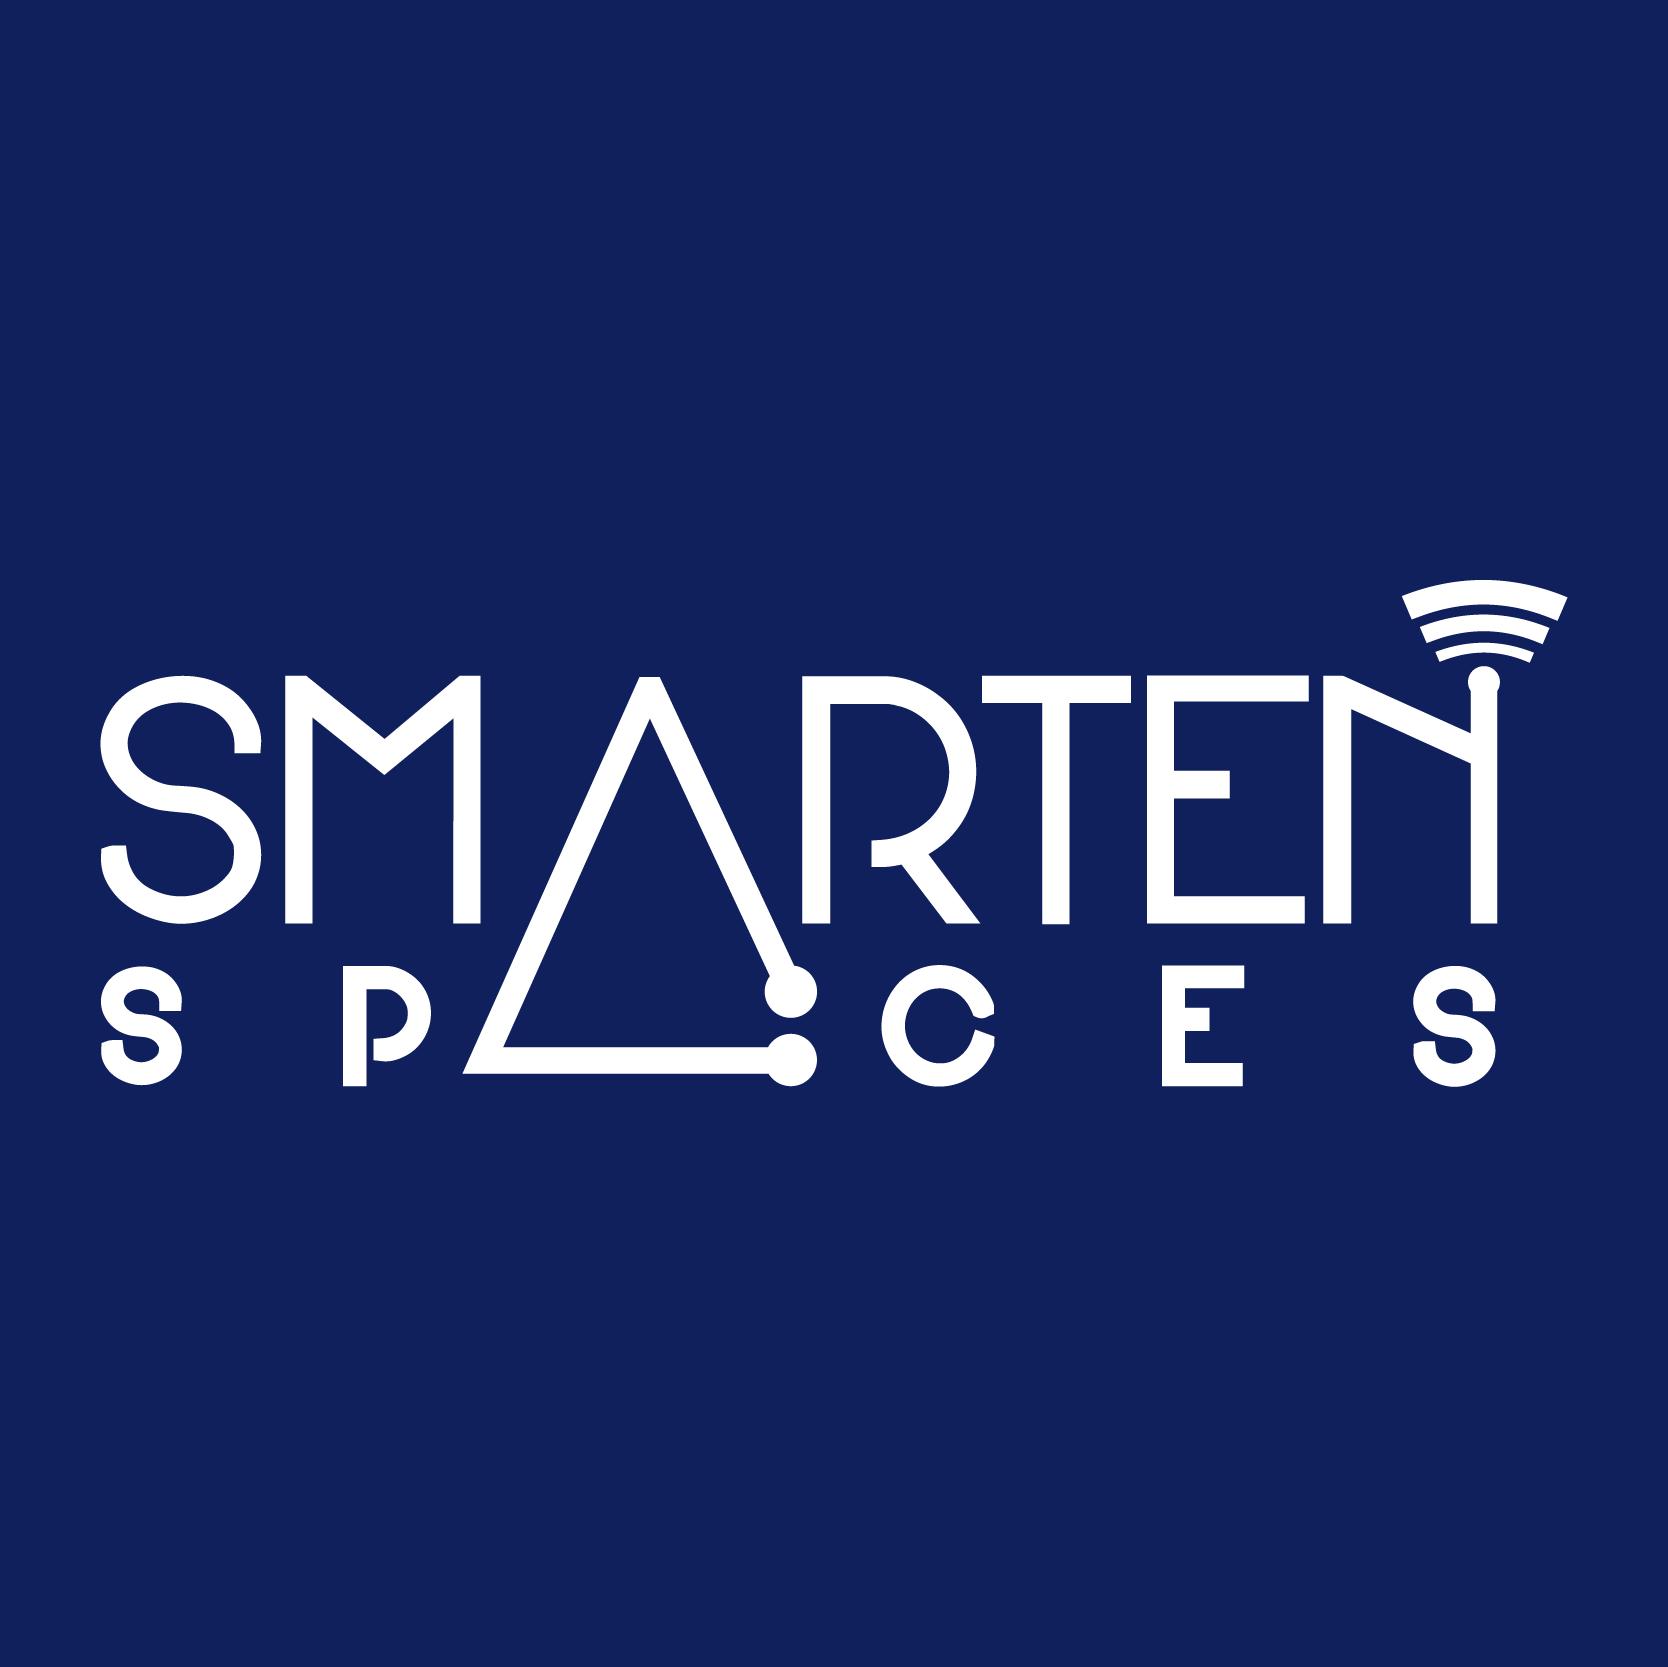 Smarten Spaces Hybrid Workplace Software